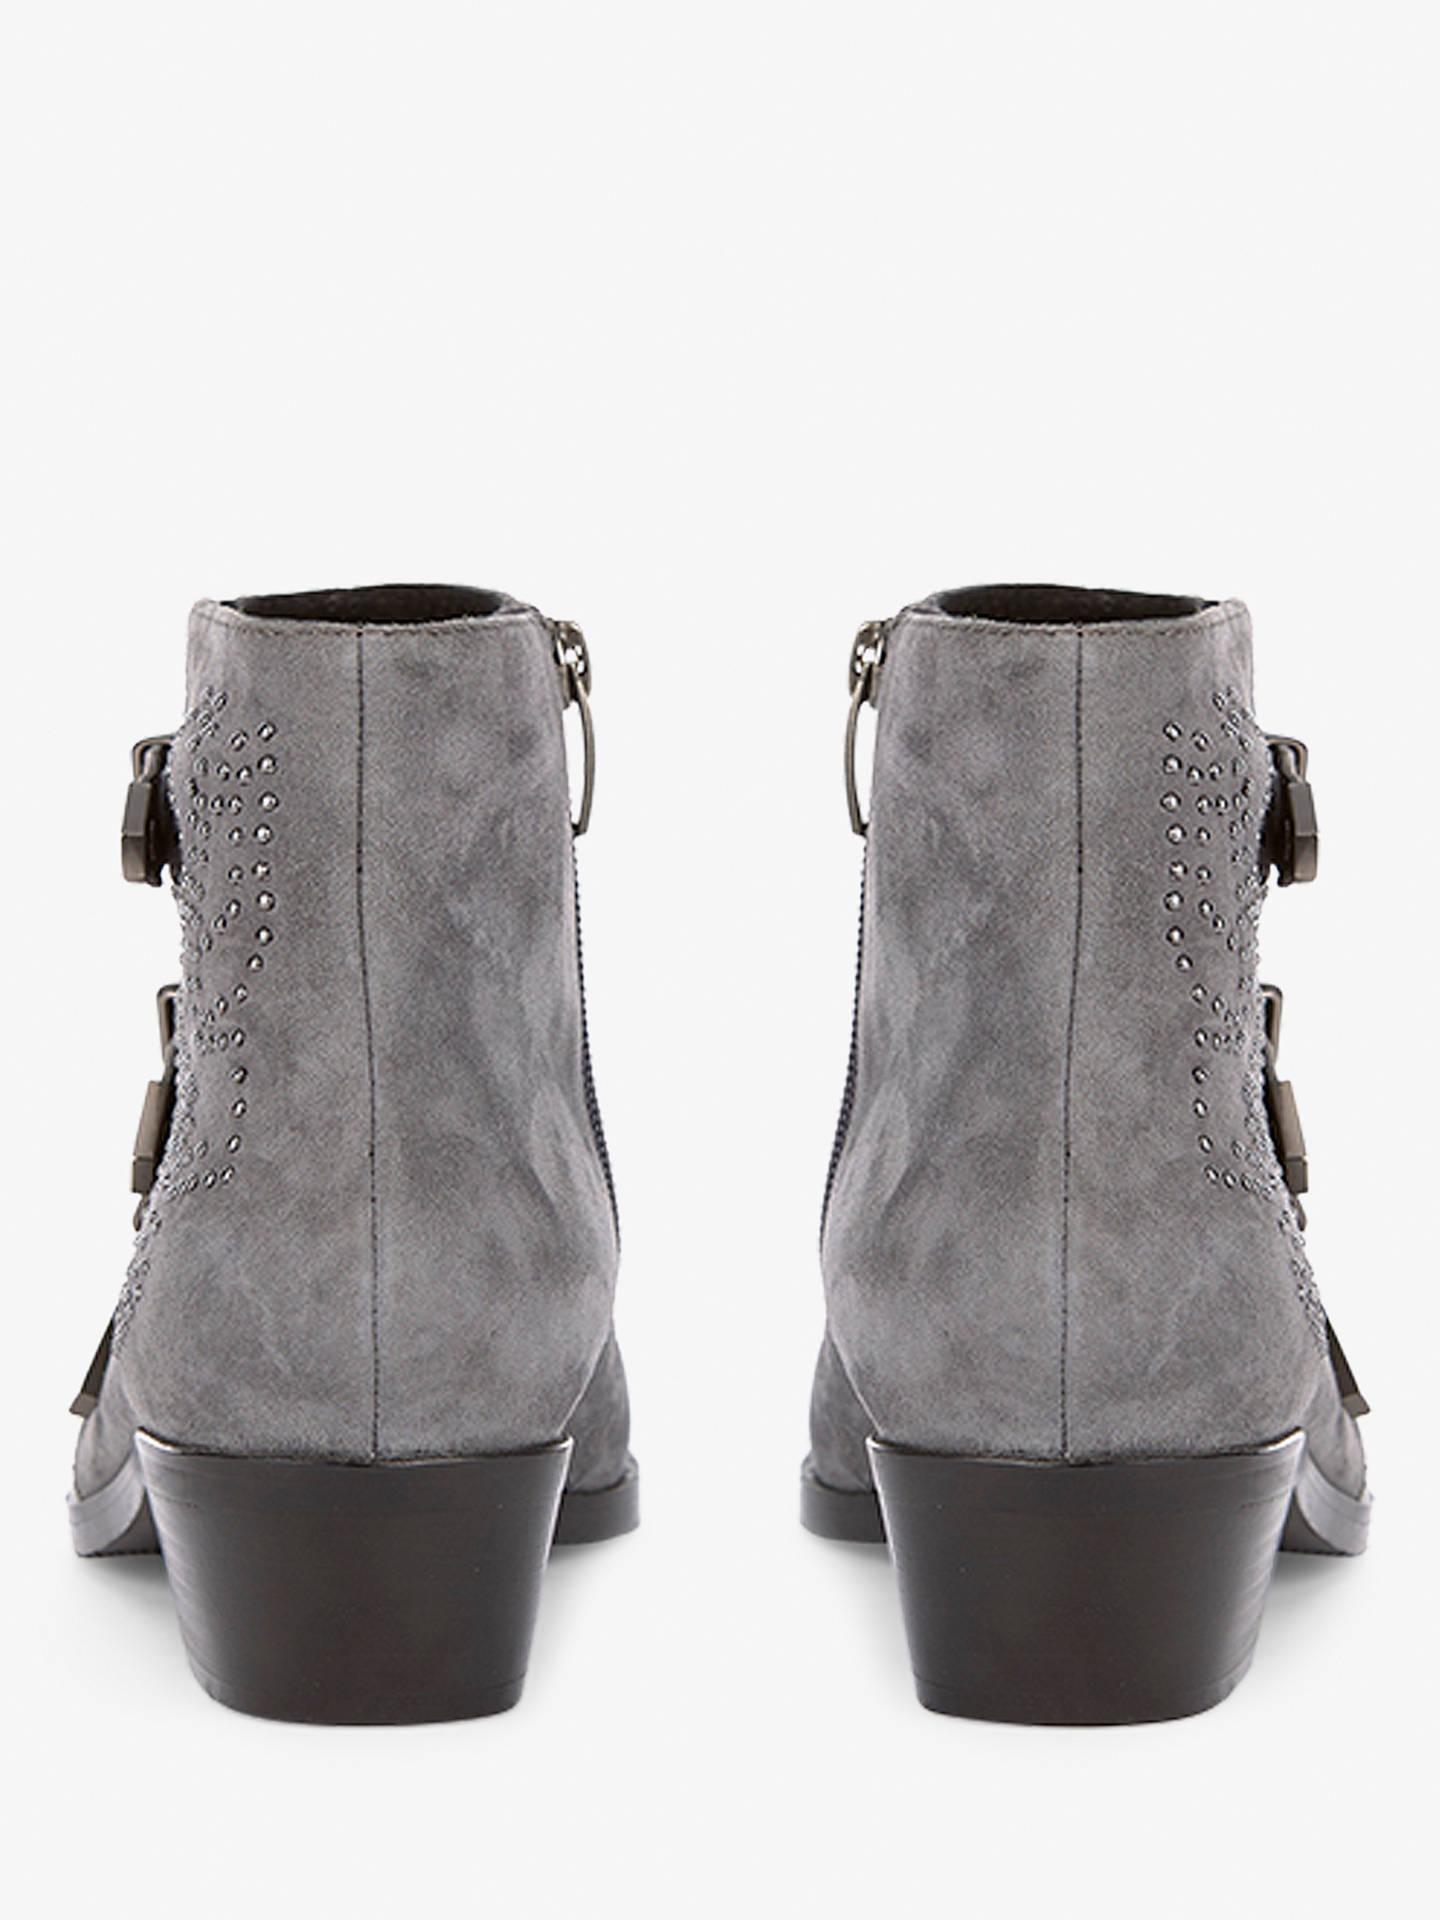 76a6303671a Mint Velvet Autumn Triple Buckle Ankle Boots, Grey Suede at John ...